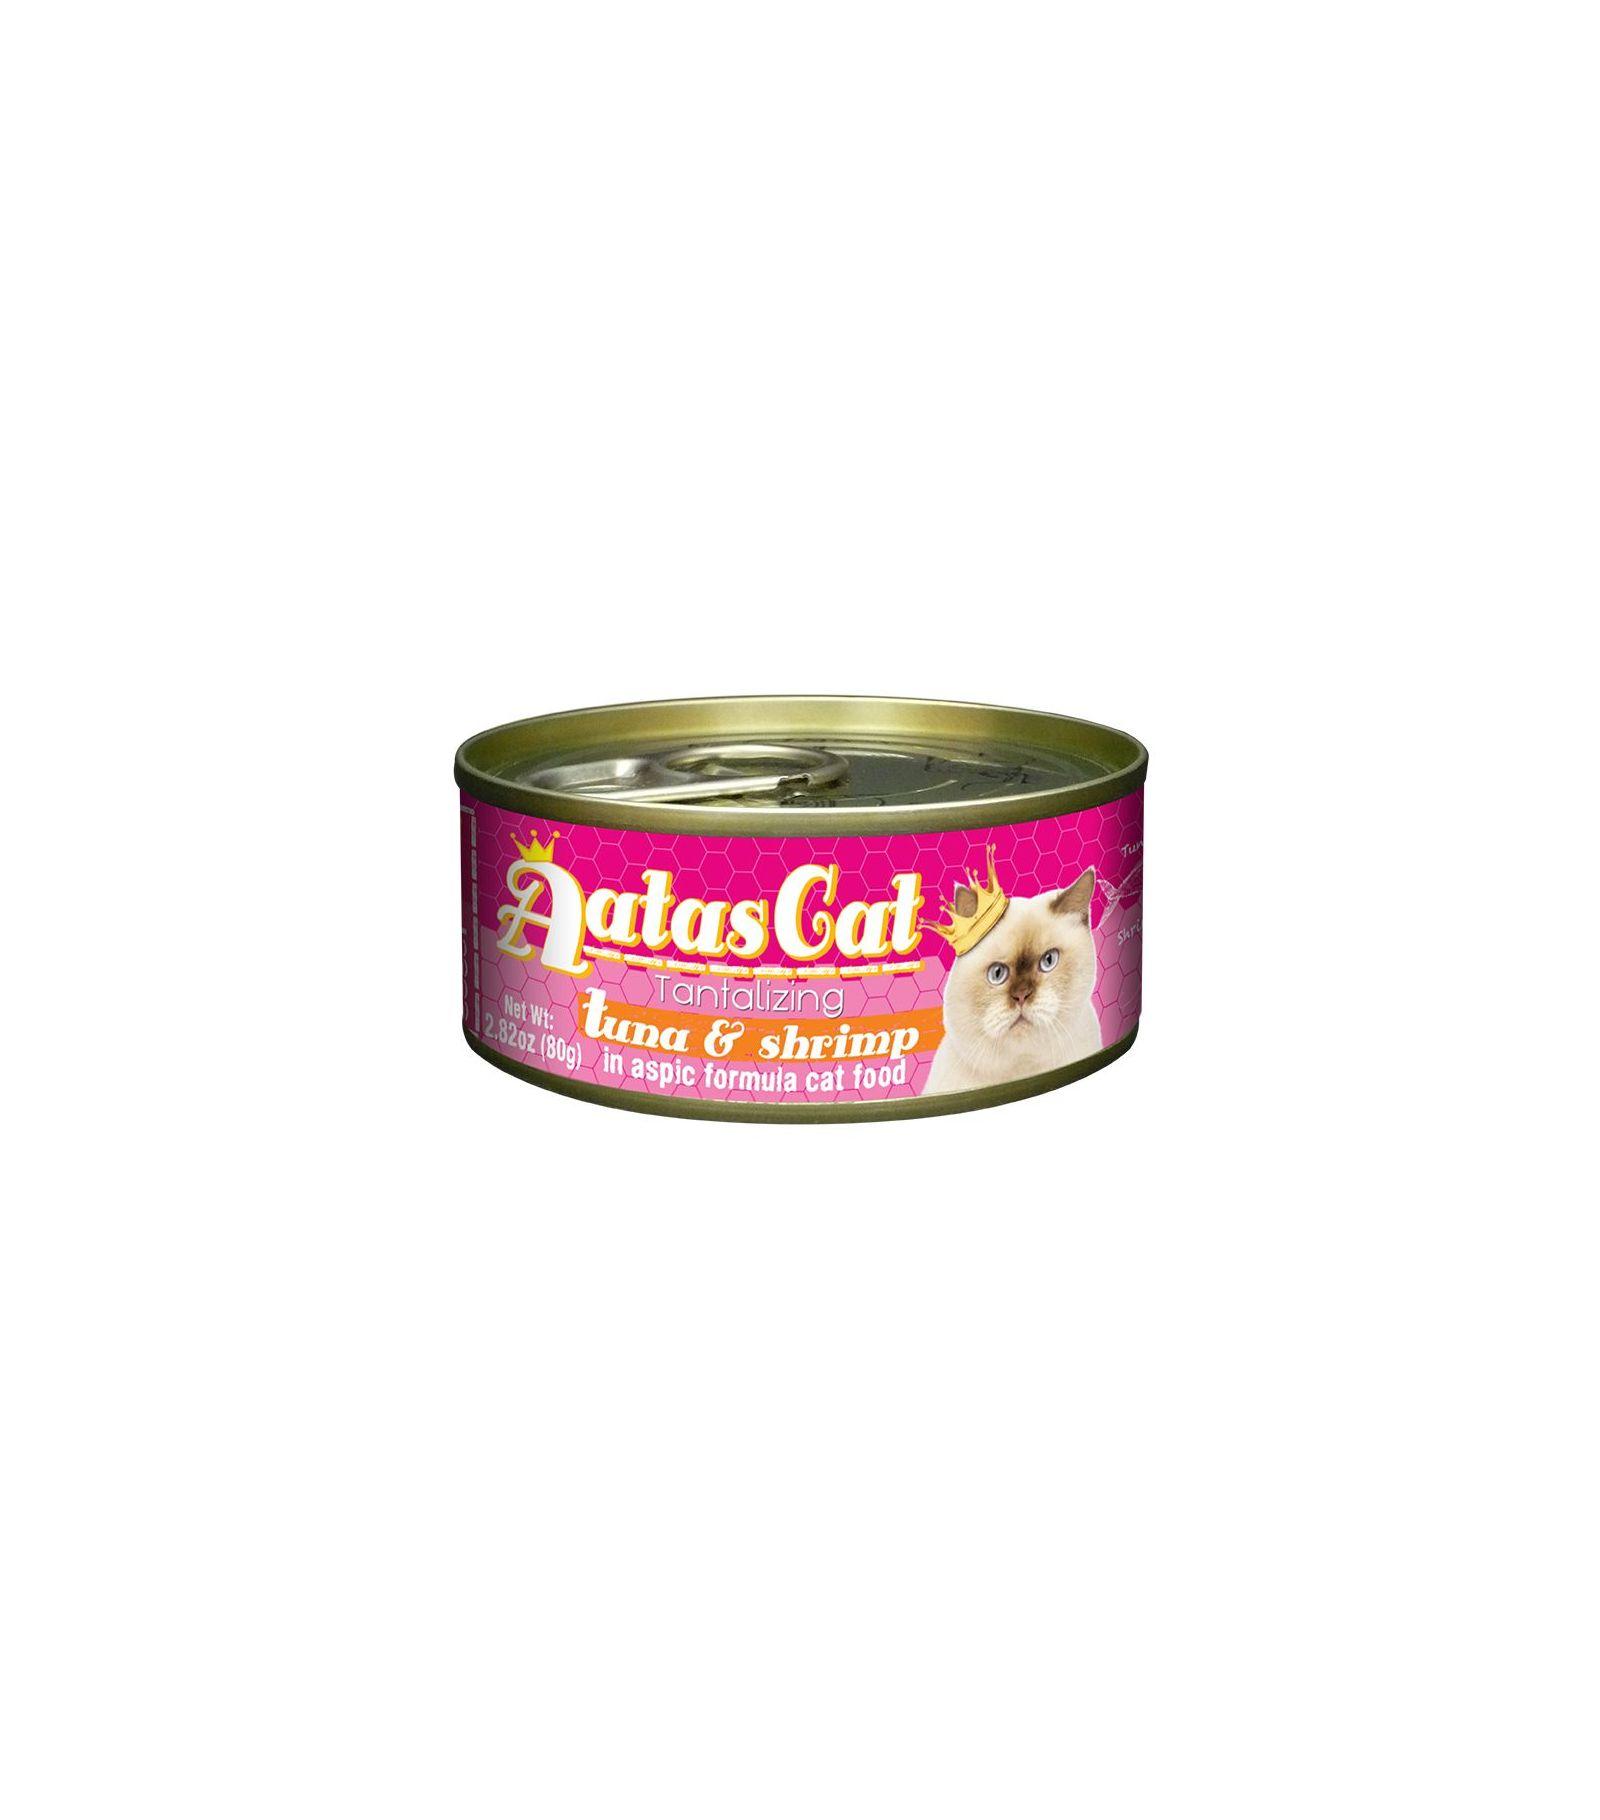 Konservas katėms AATAS Cat Tantalizing Tuna&Shrimp, 80 g